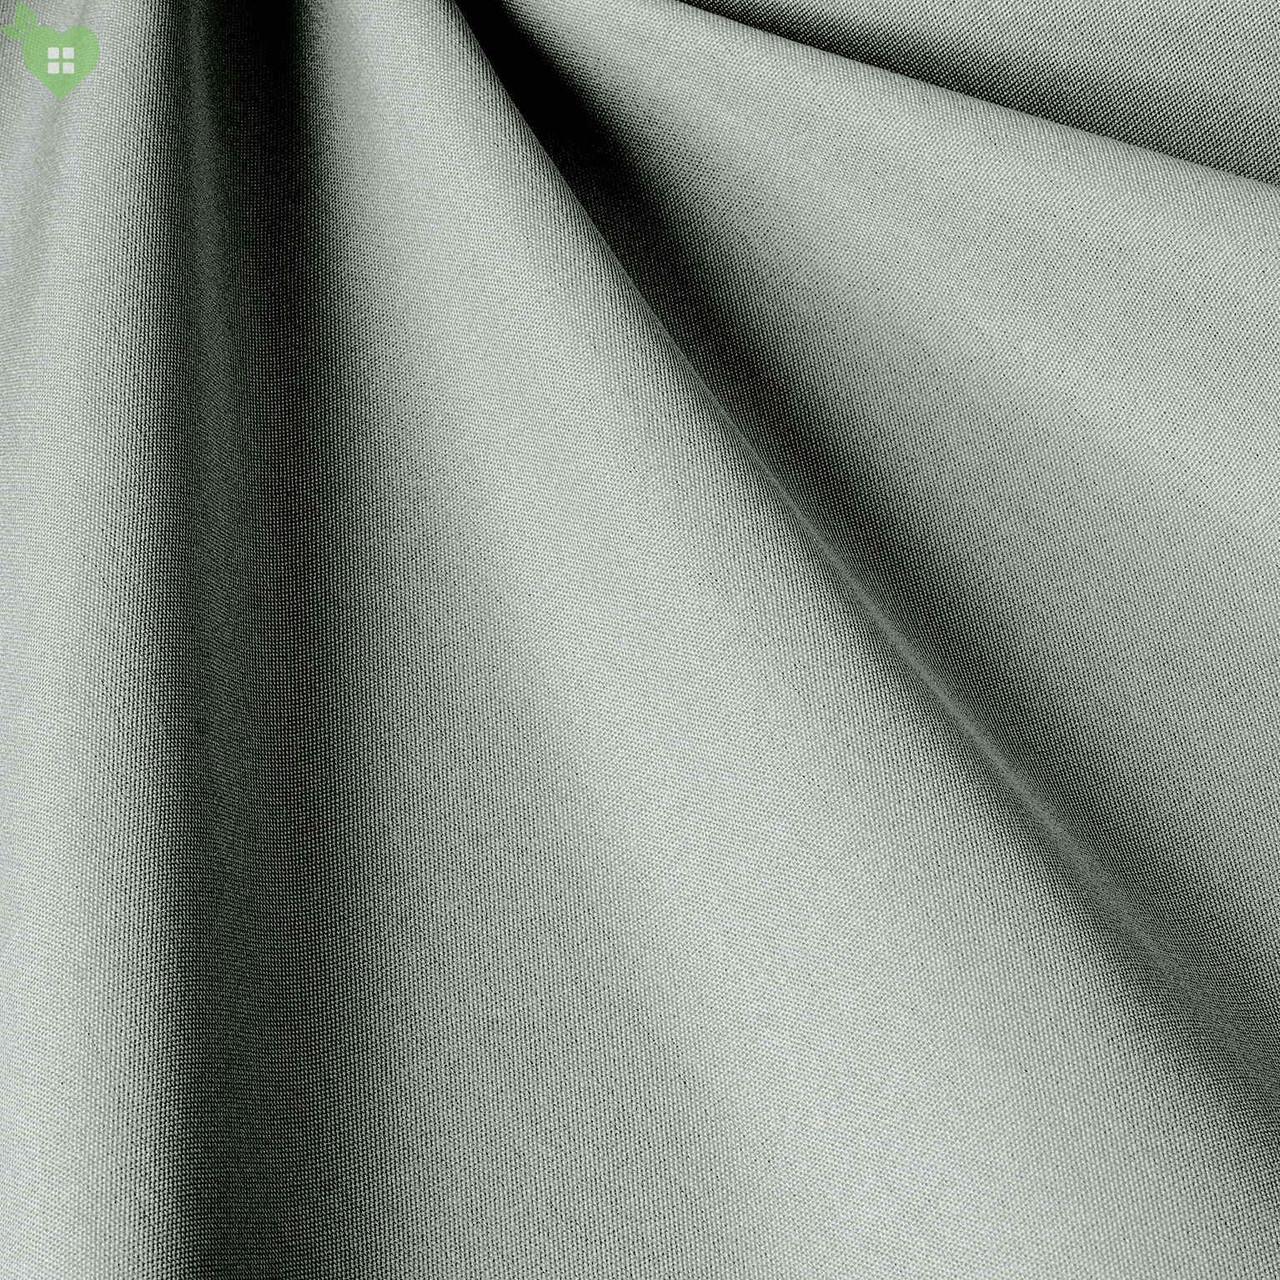 Ткань для улицы: Дралон (Outdoor) 400333v33